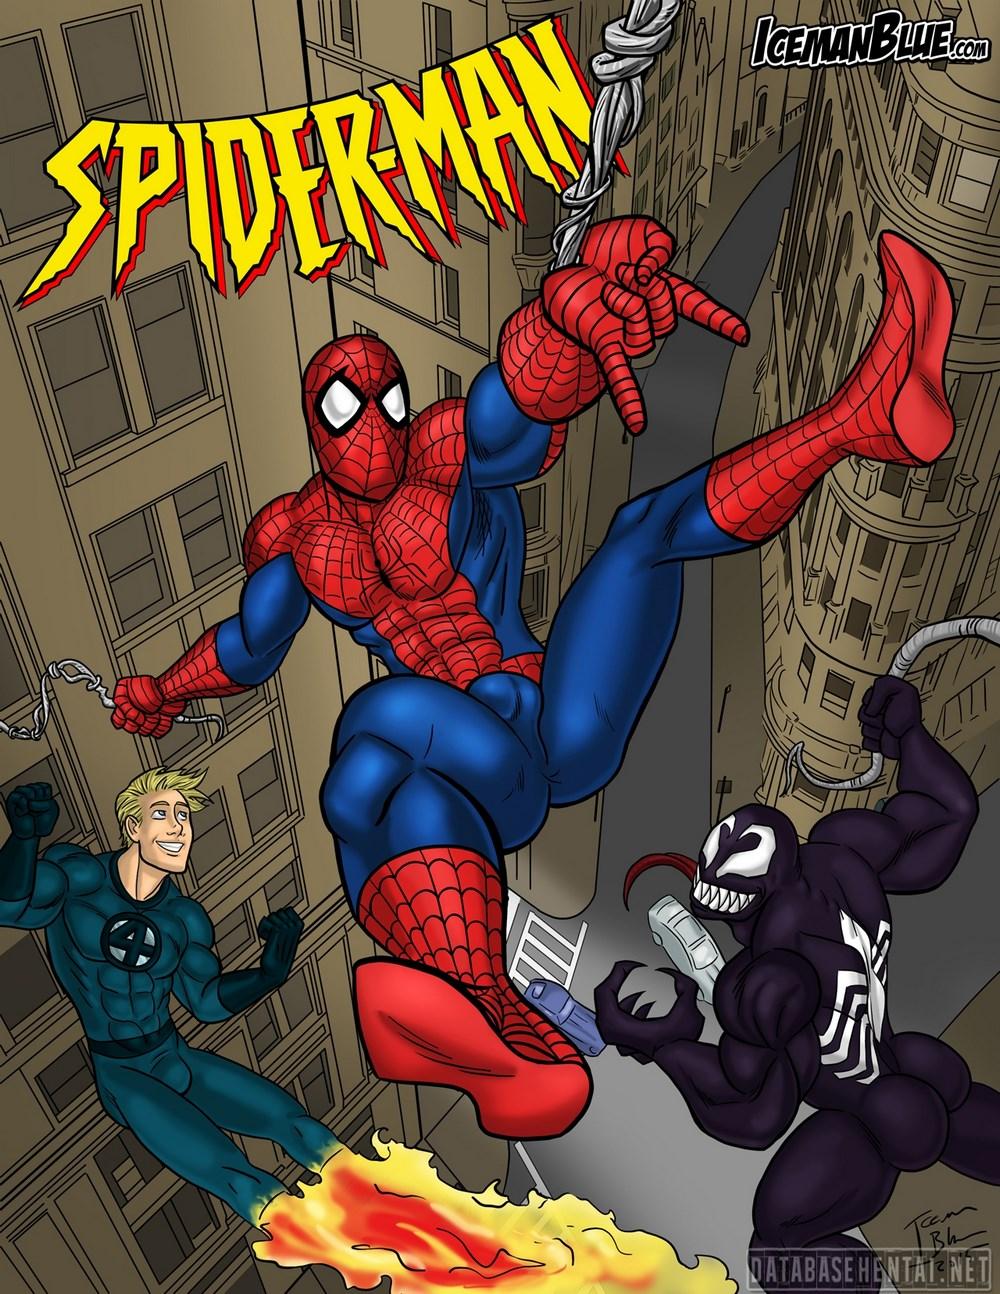 Spider-Man Queimando a Rosca